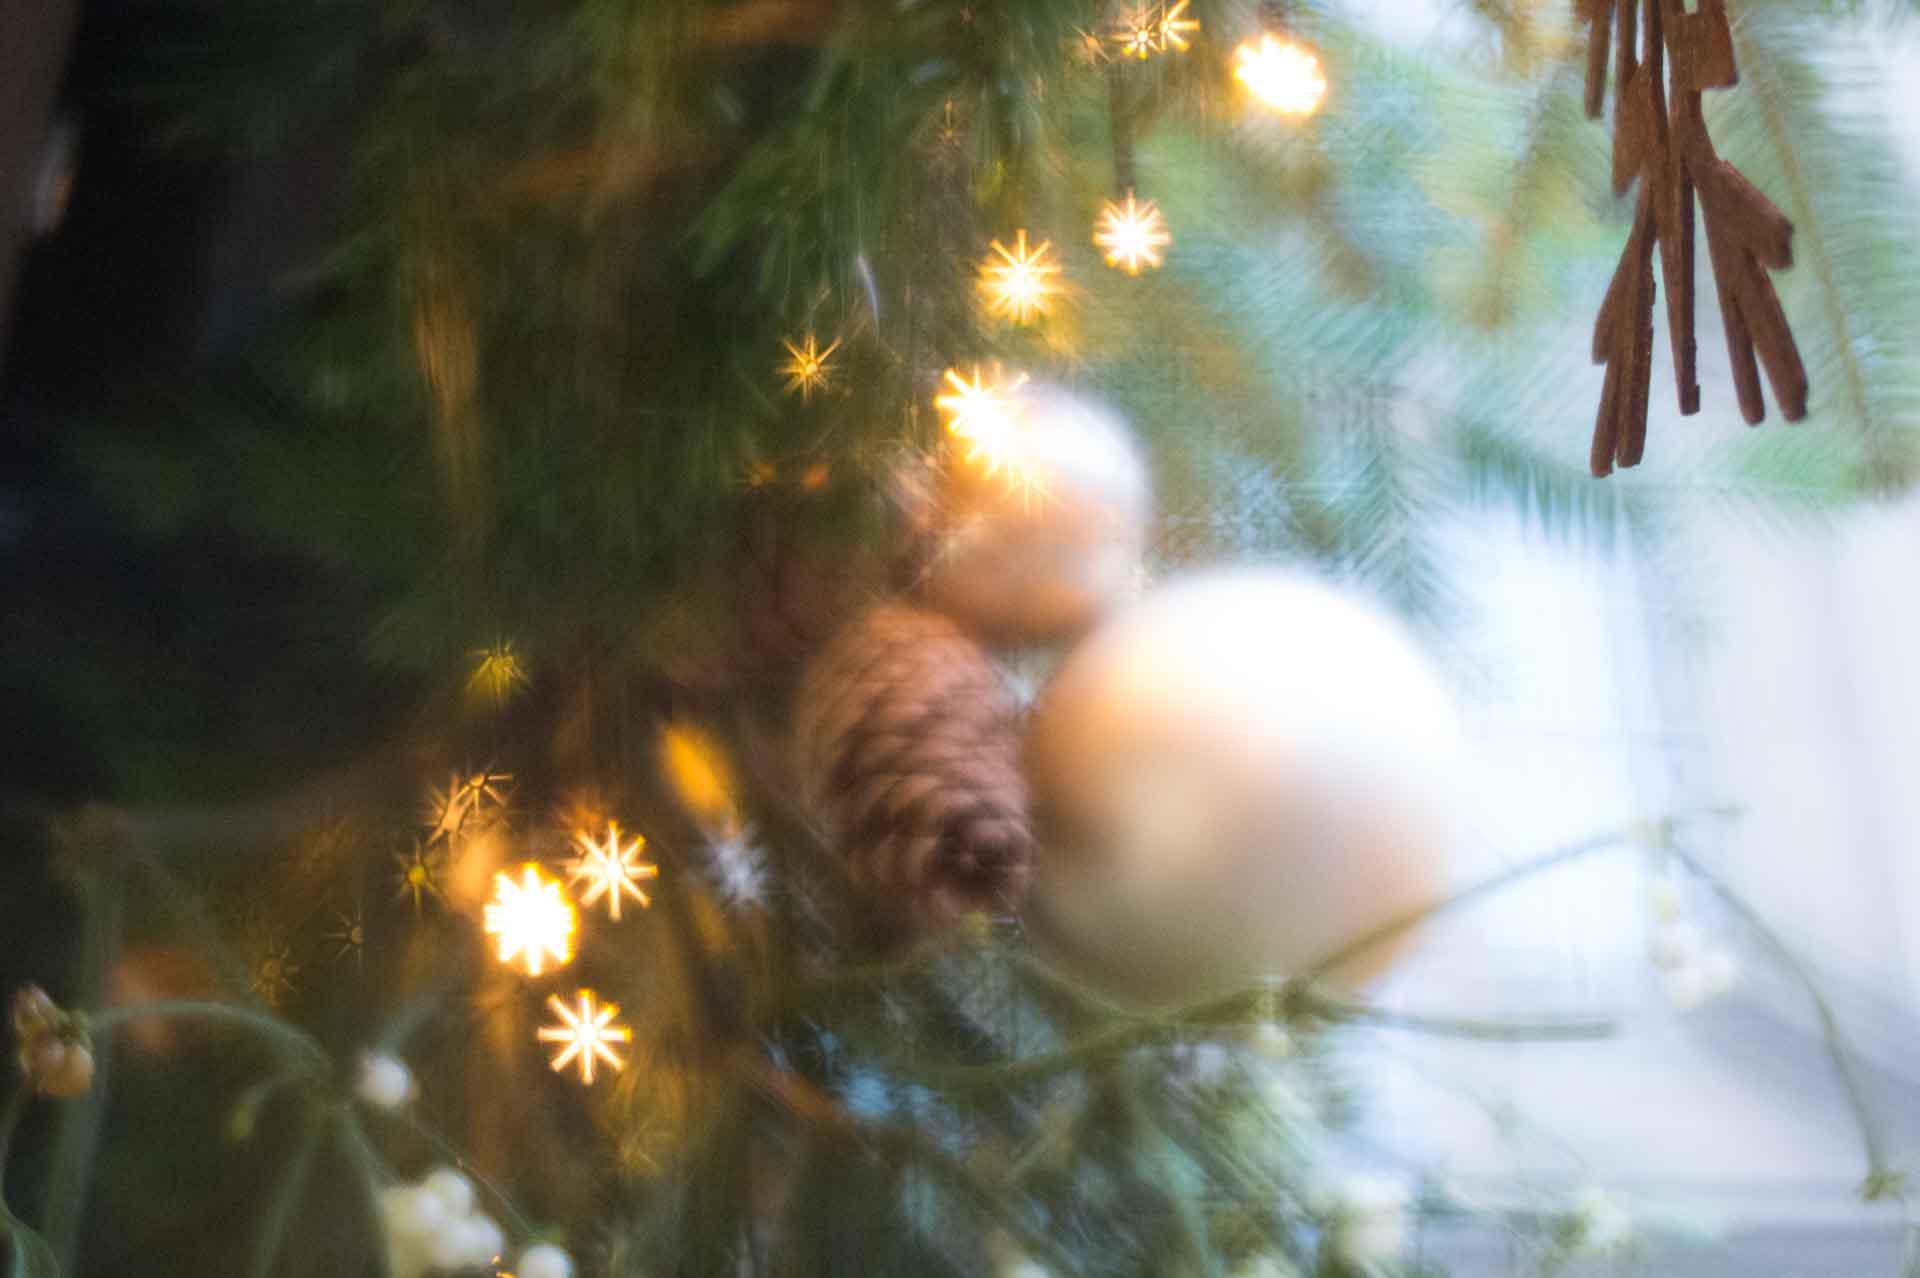 Weihnachten, Fotoshooting, Artlens, Lomography, Bokeh, Daguerreotype Achromat, Dekoration, Fotograf Stuttgart